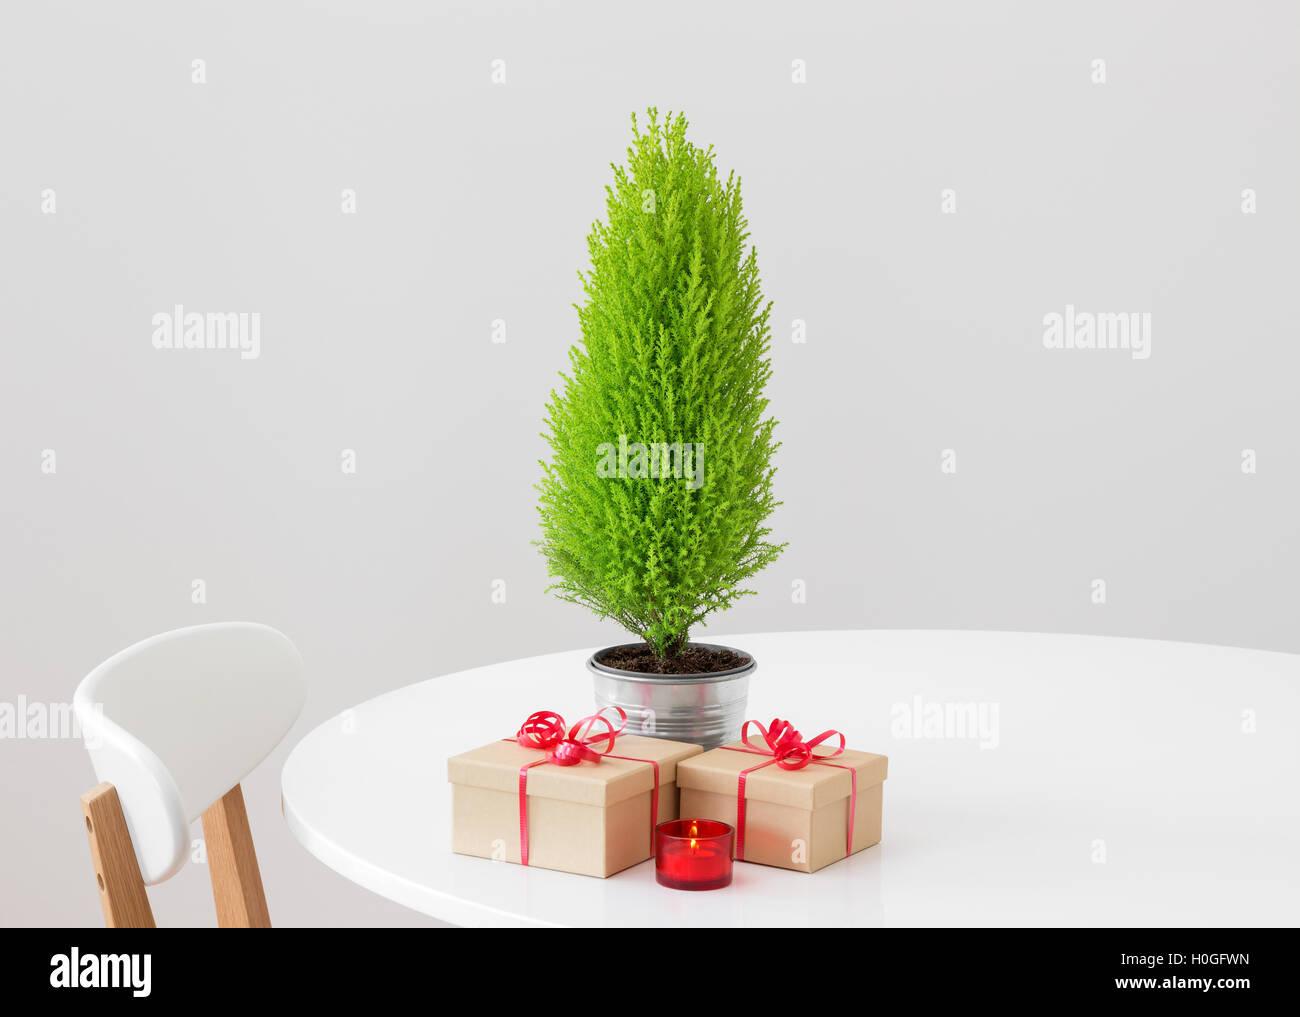 Tree Table Christmas Indoor Nobody Stock Photos & Tree Table ...